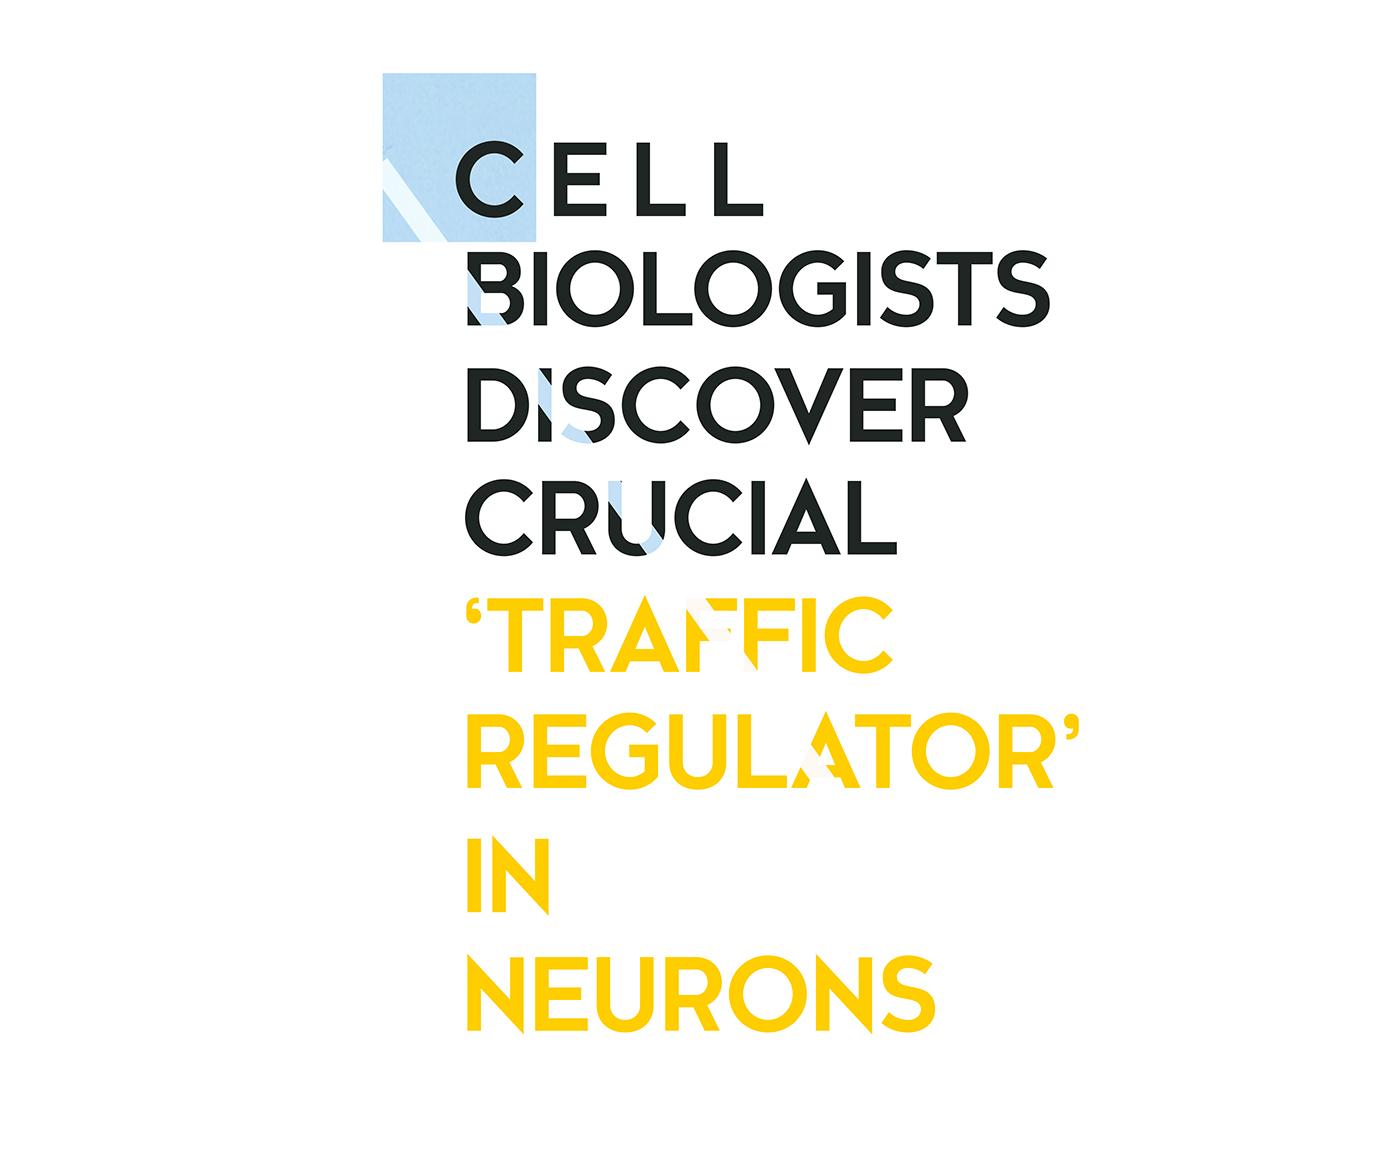 science neurons cytoskeleton Cell biologists regulator molecules brain nastplas Nerve